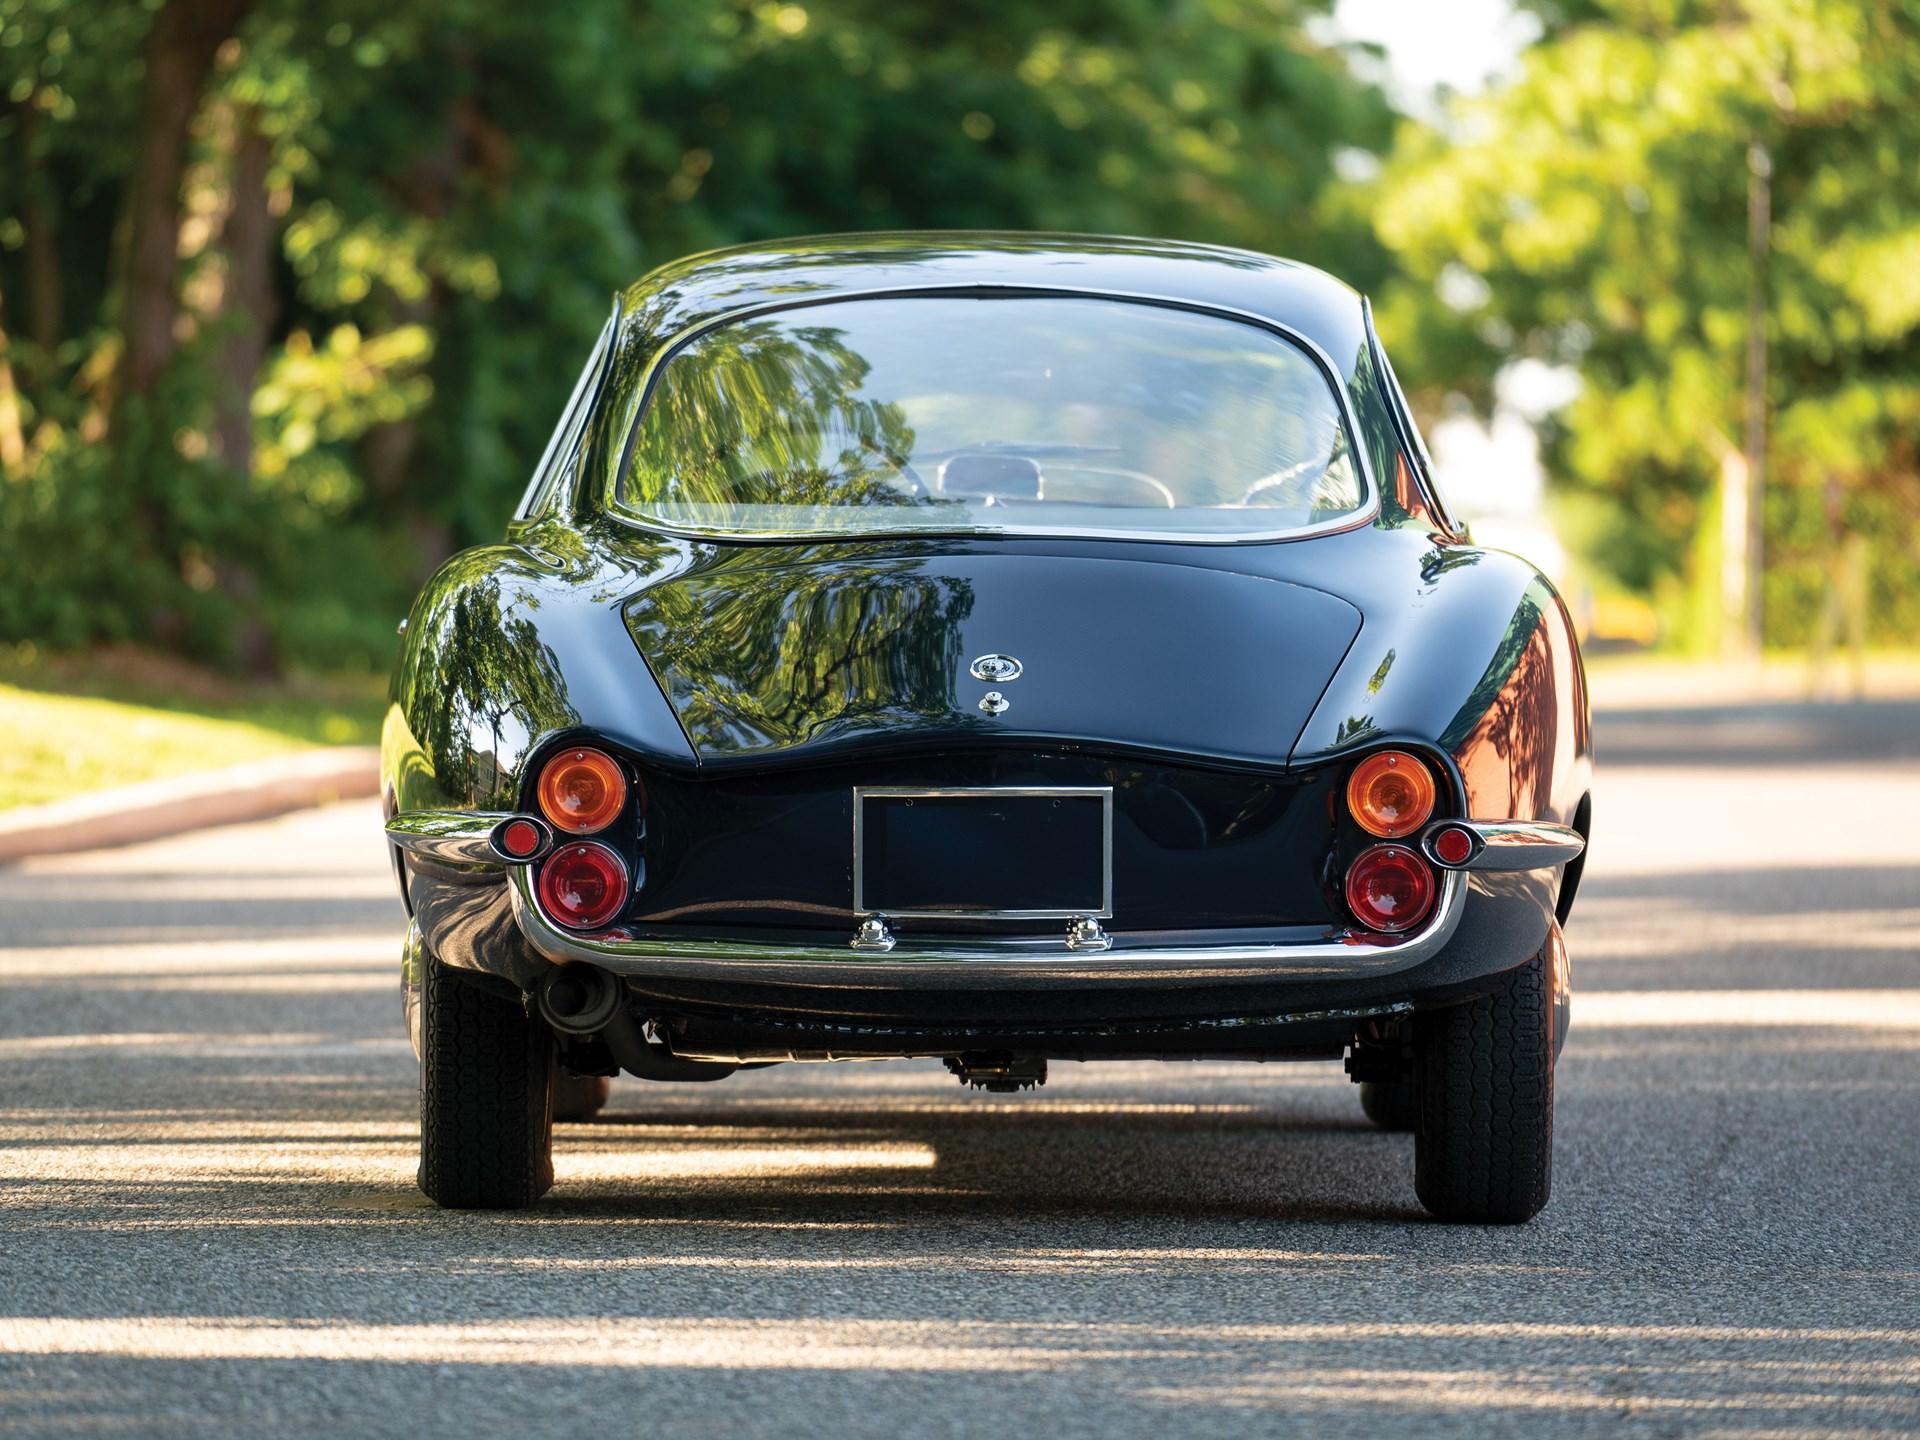 rm sotheby's - 1960 alfa romeo giulietta sprint specialebertone